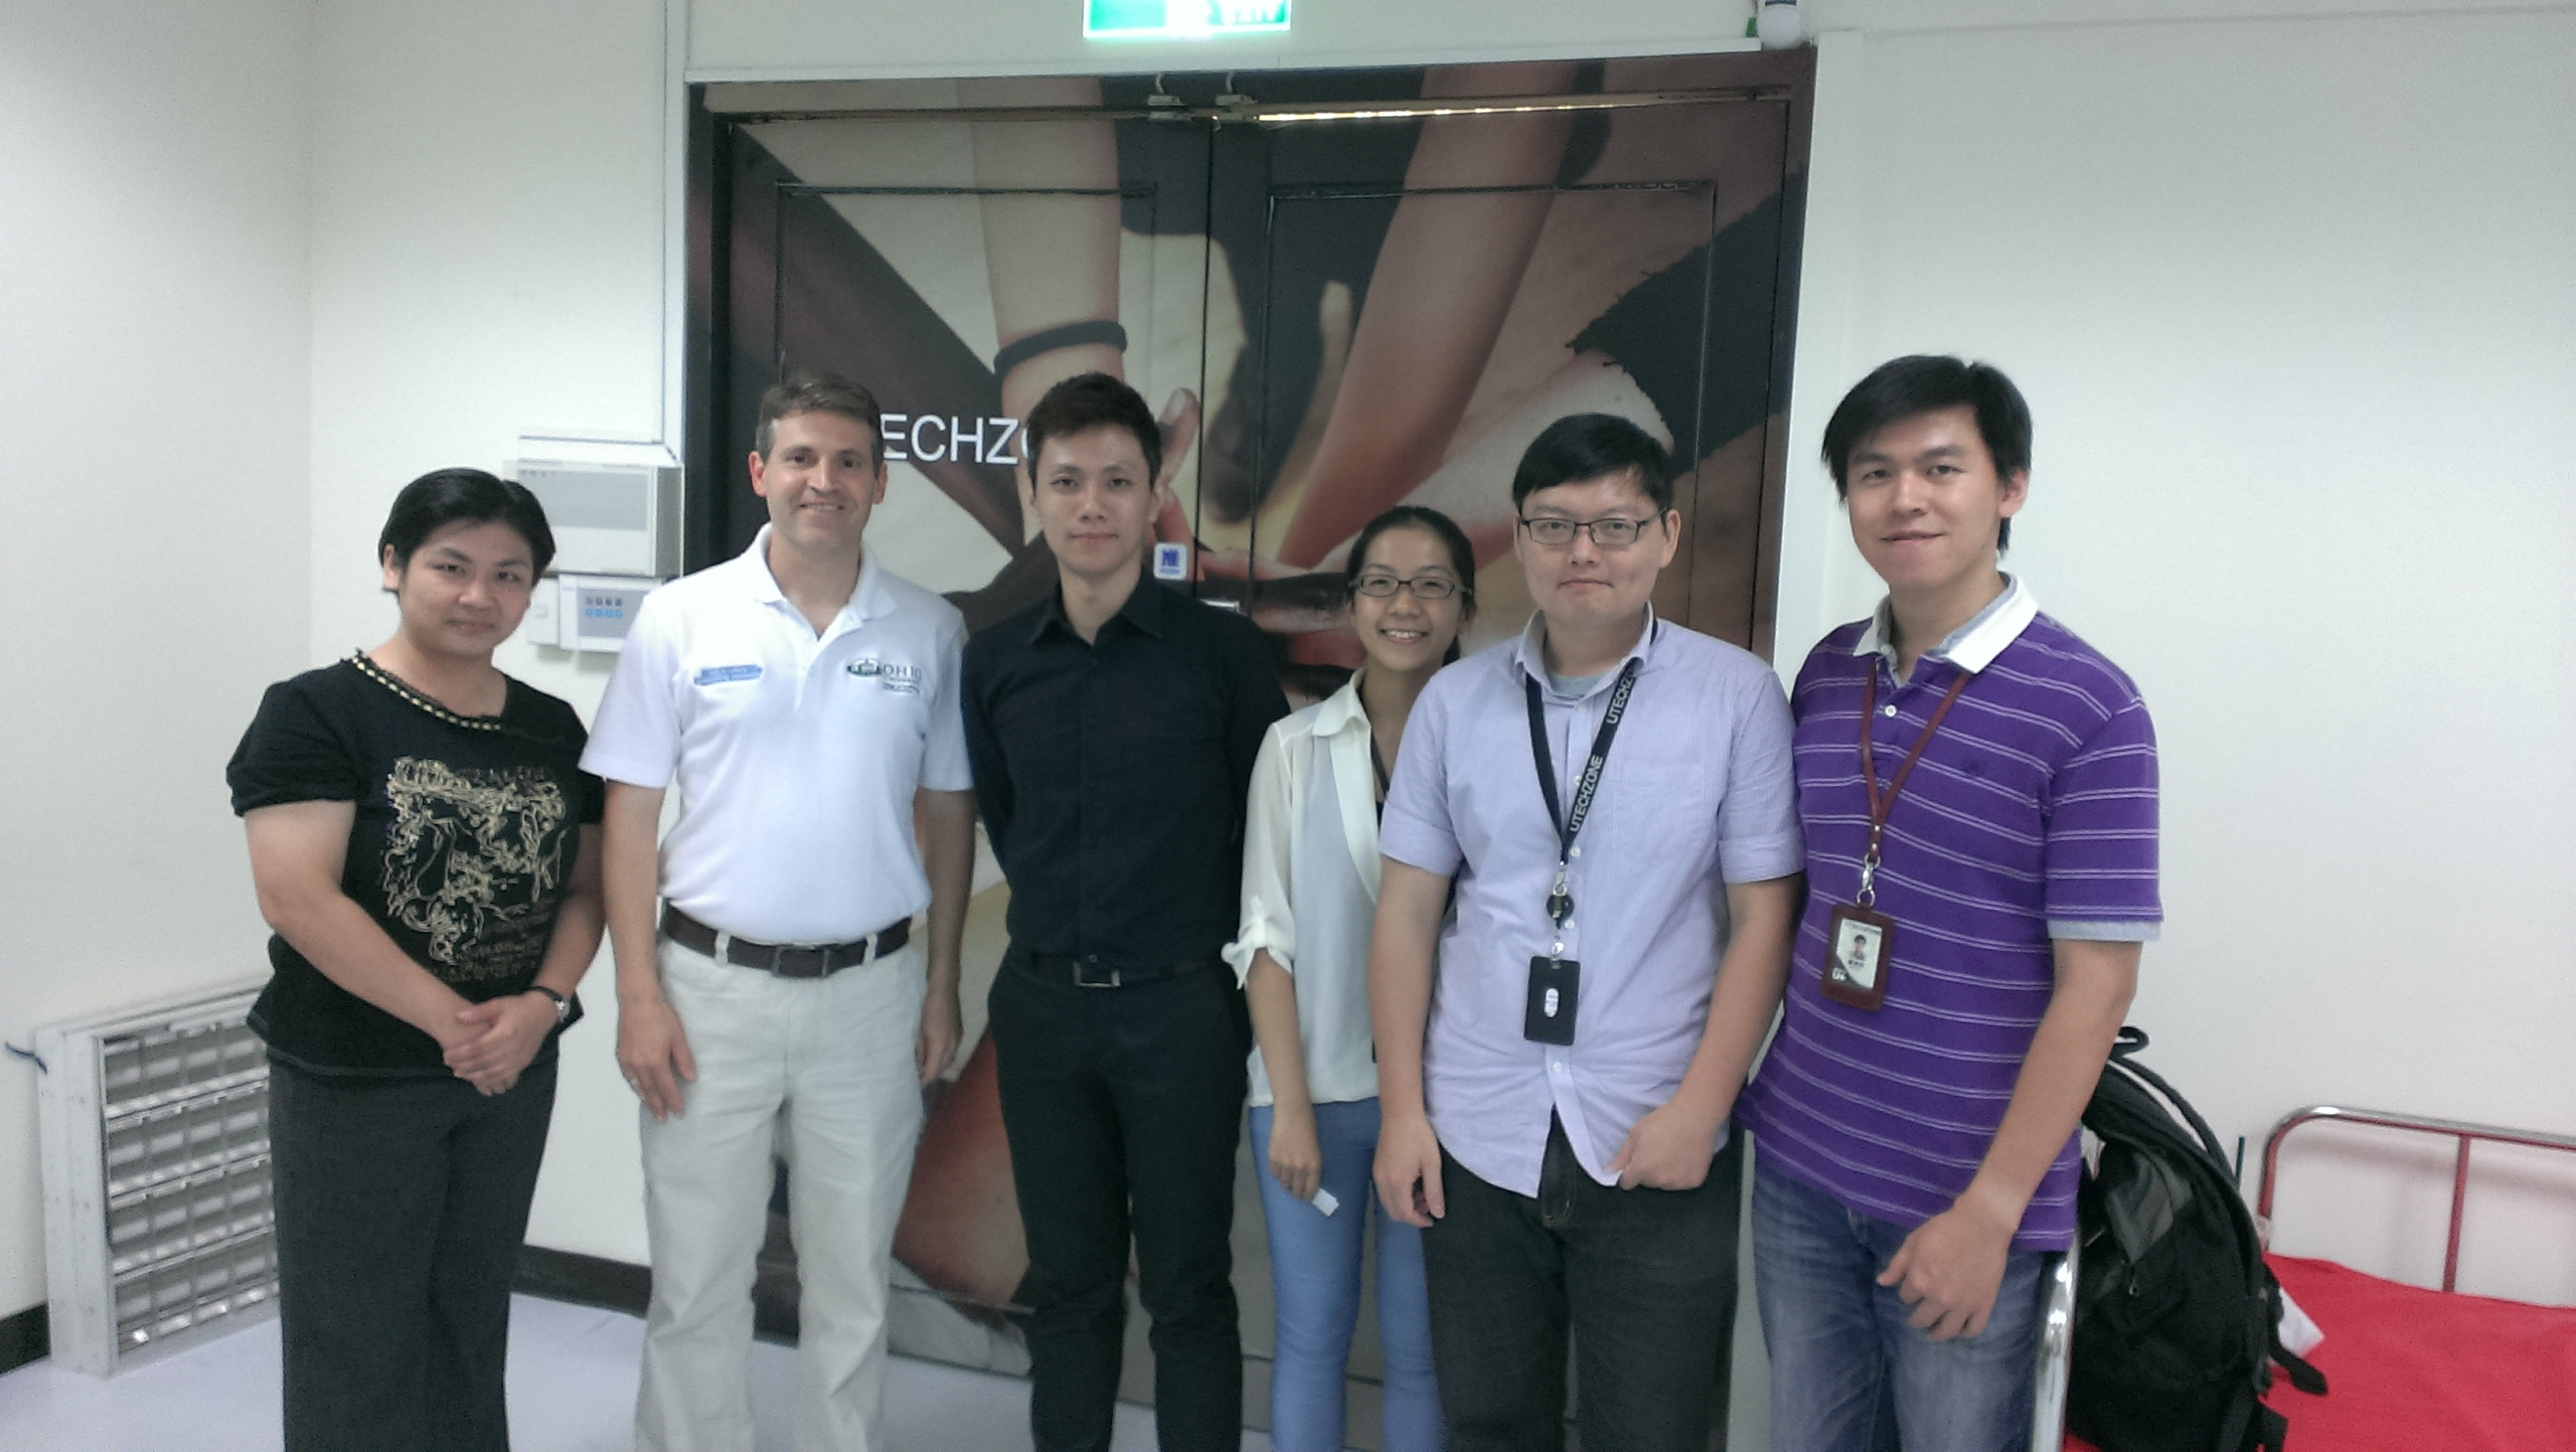 Photo of John McCarthy with Utechzone developers